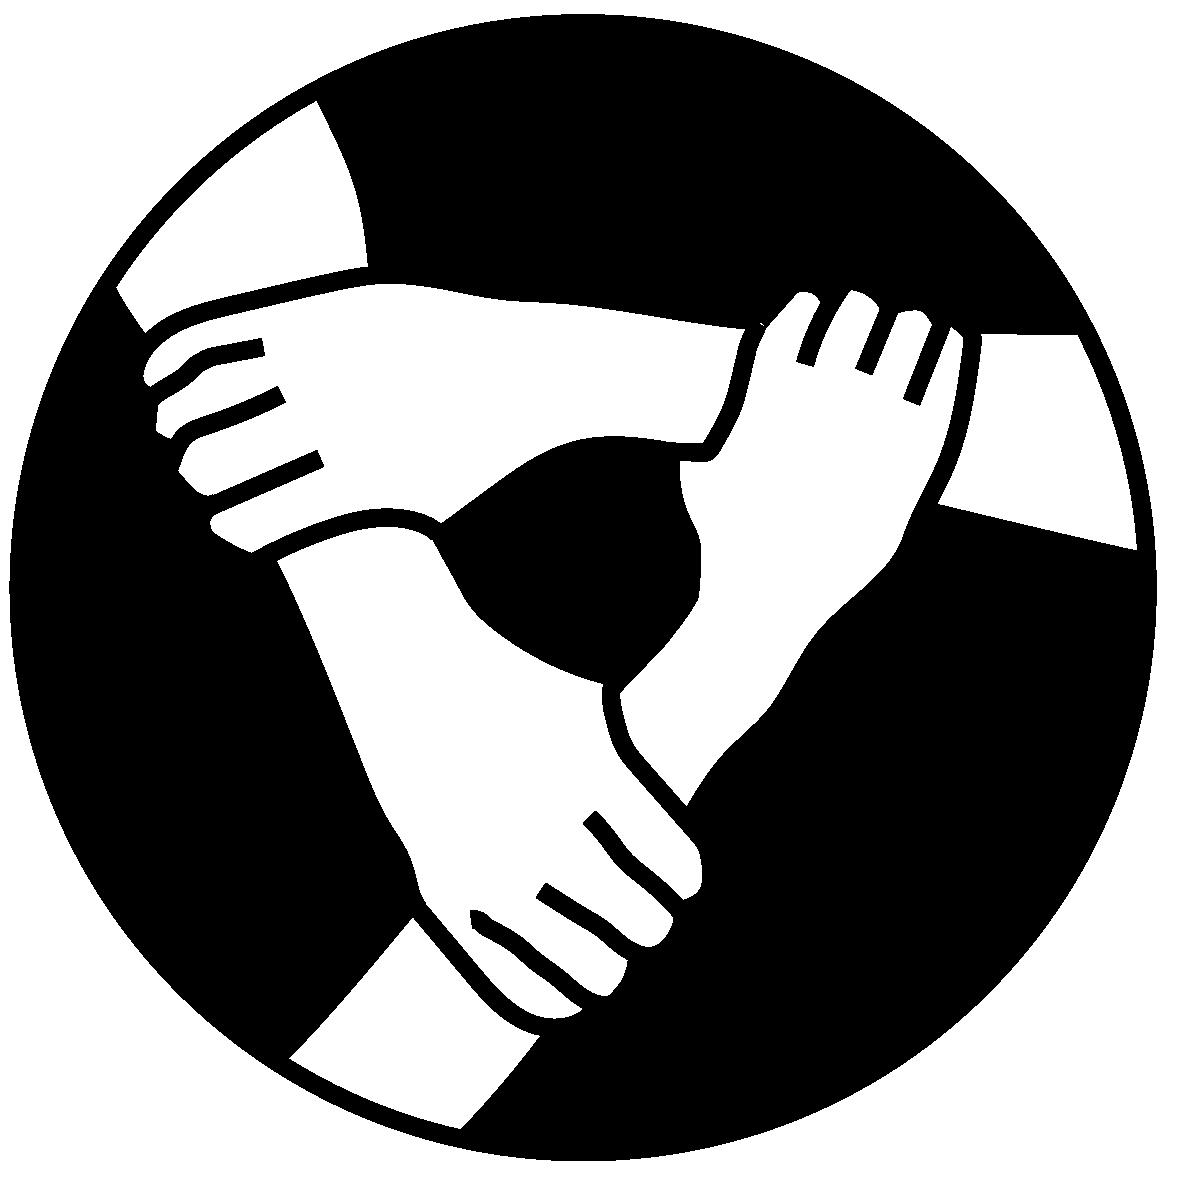 The DECO logo.